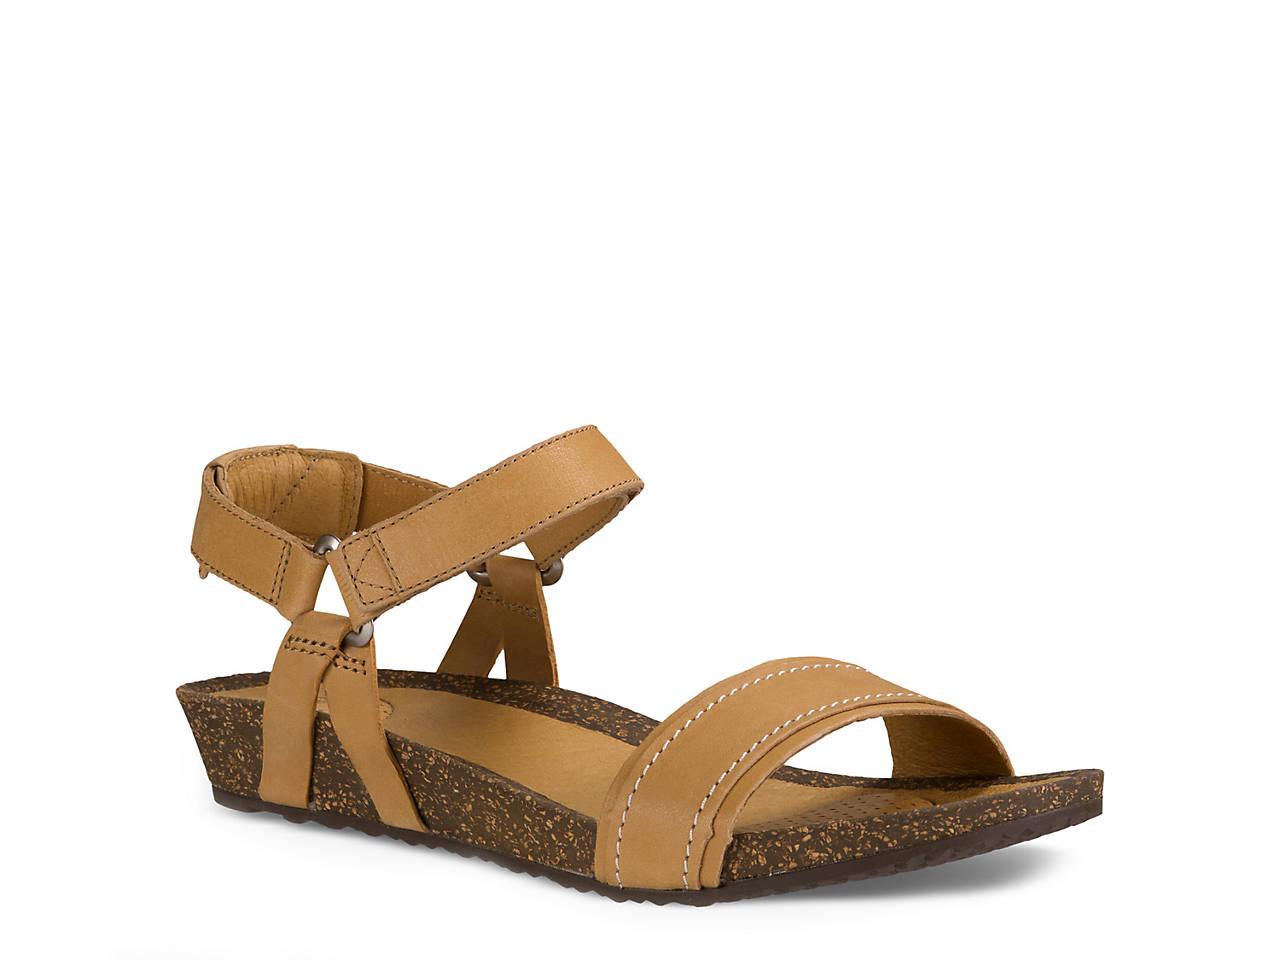 64e3d982a Teva Ysidro Stitch Flat Sandal Women s Shoes